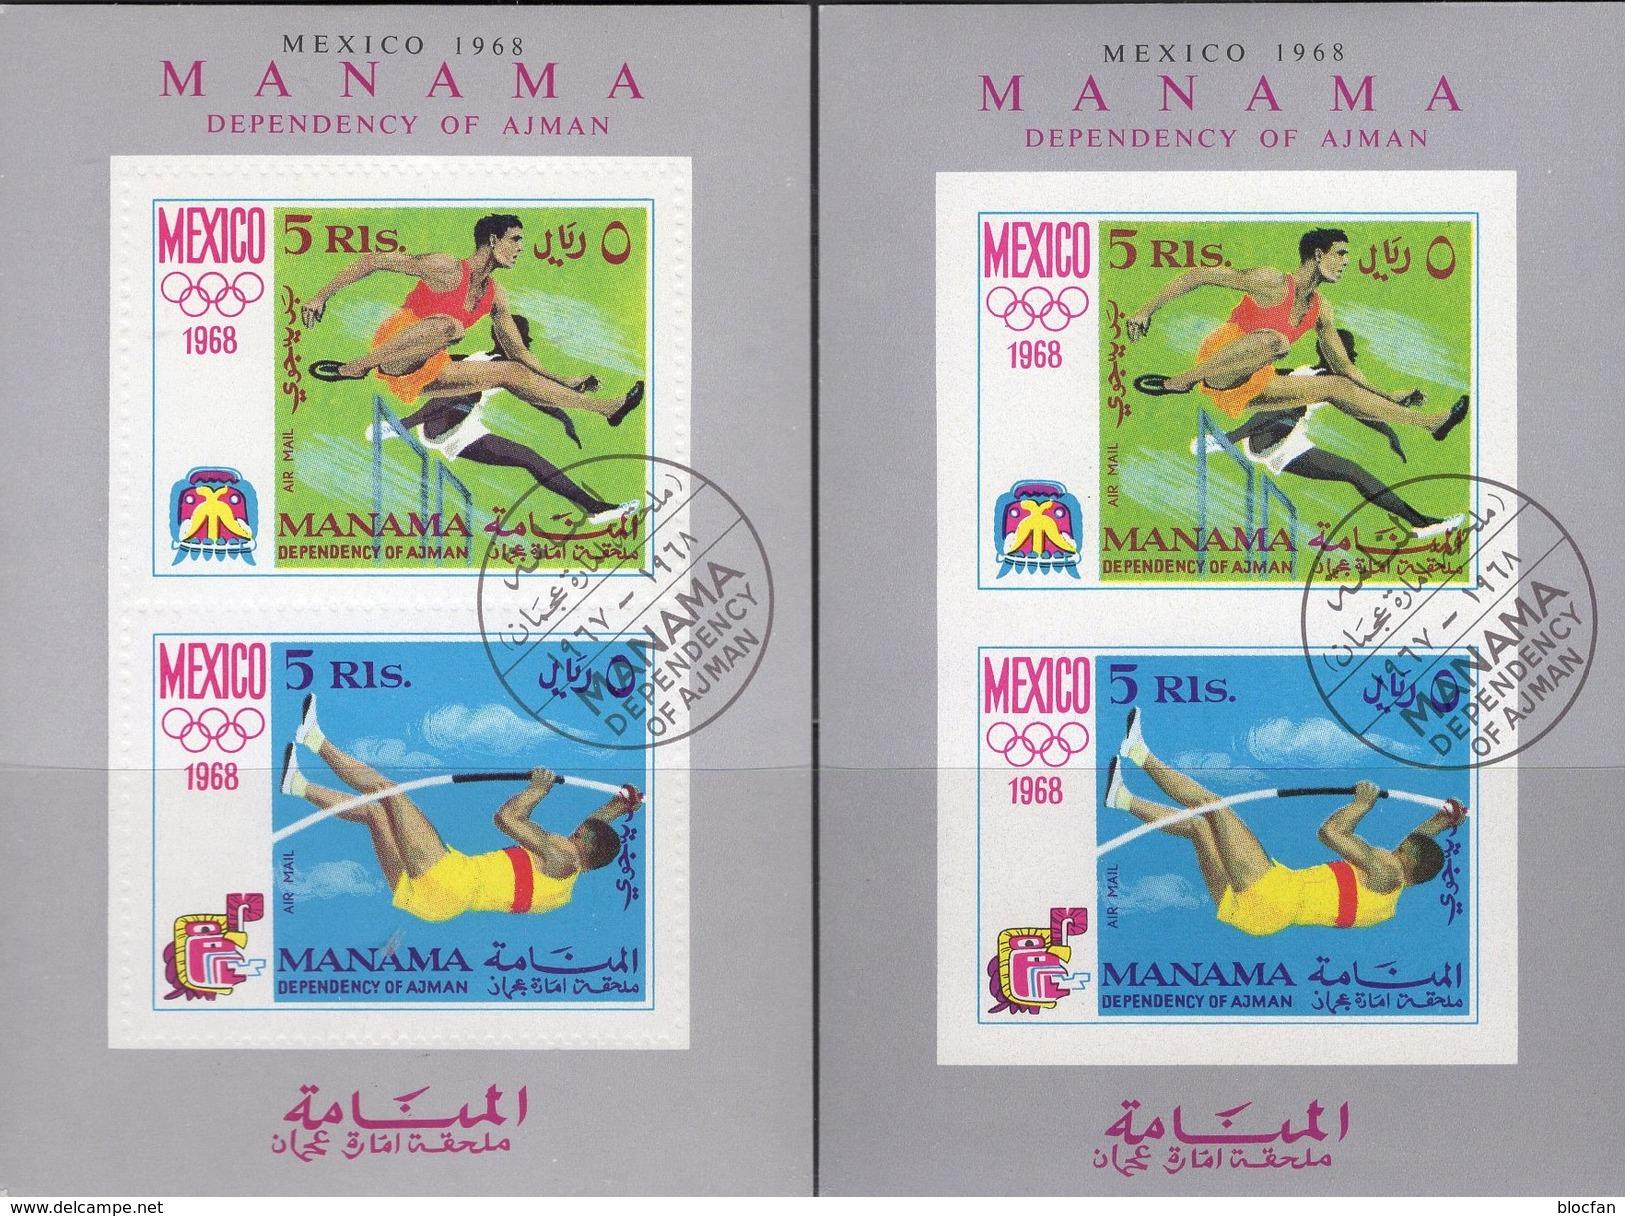 Olympia Mexiko 1968 Manama Blocks 5 A+B O 9€ Hürden-Lauf Hochsprung S/s Blocs Sport Olympics Sheets Bf VAE Adschman - Summer 1968: Mexico City